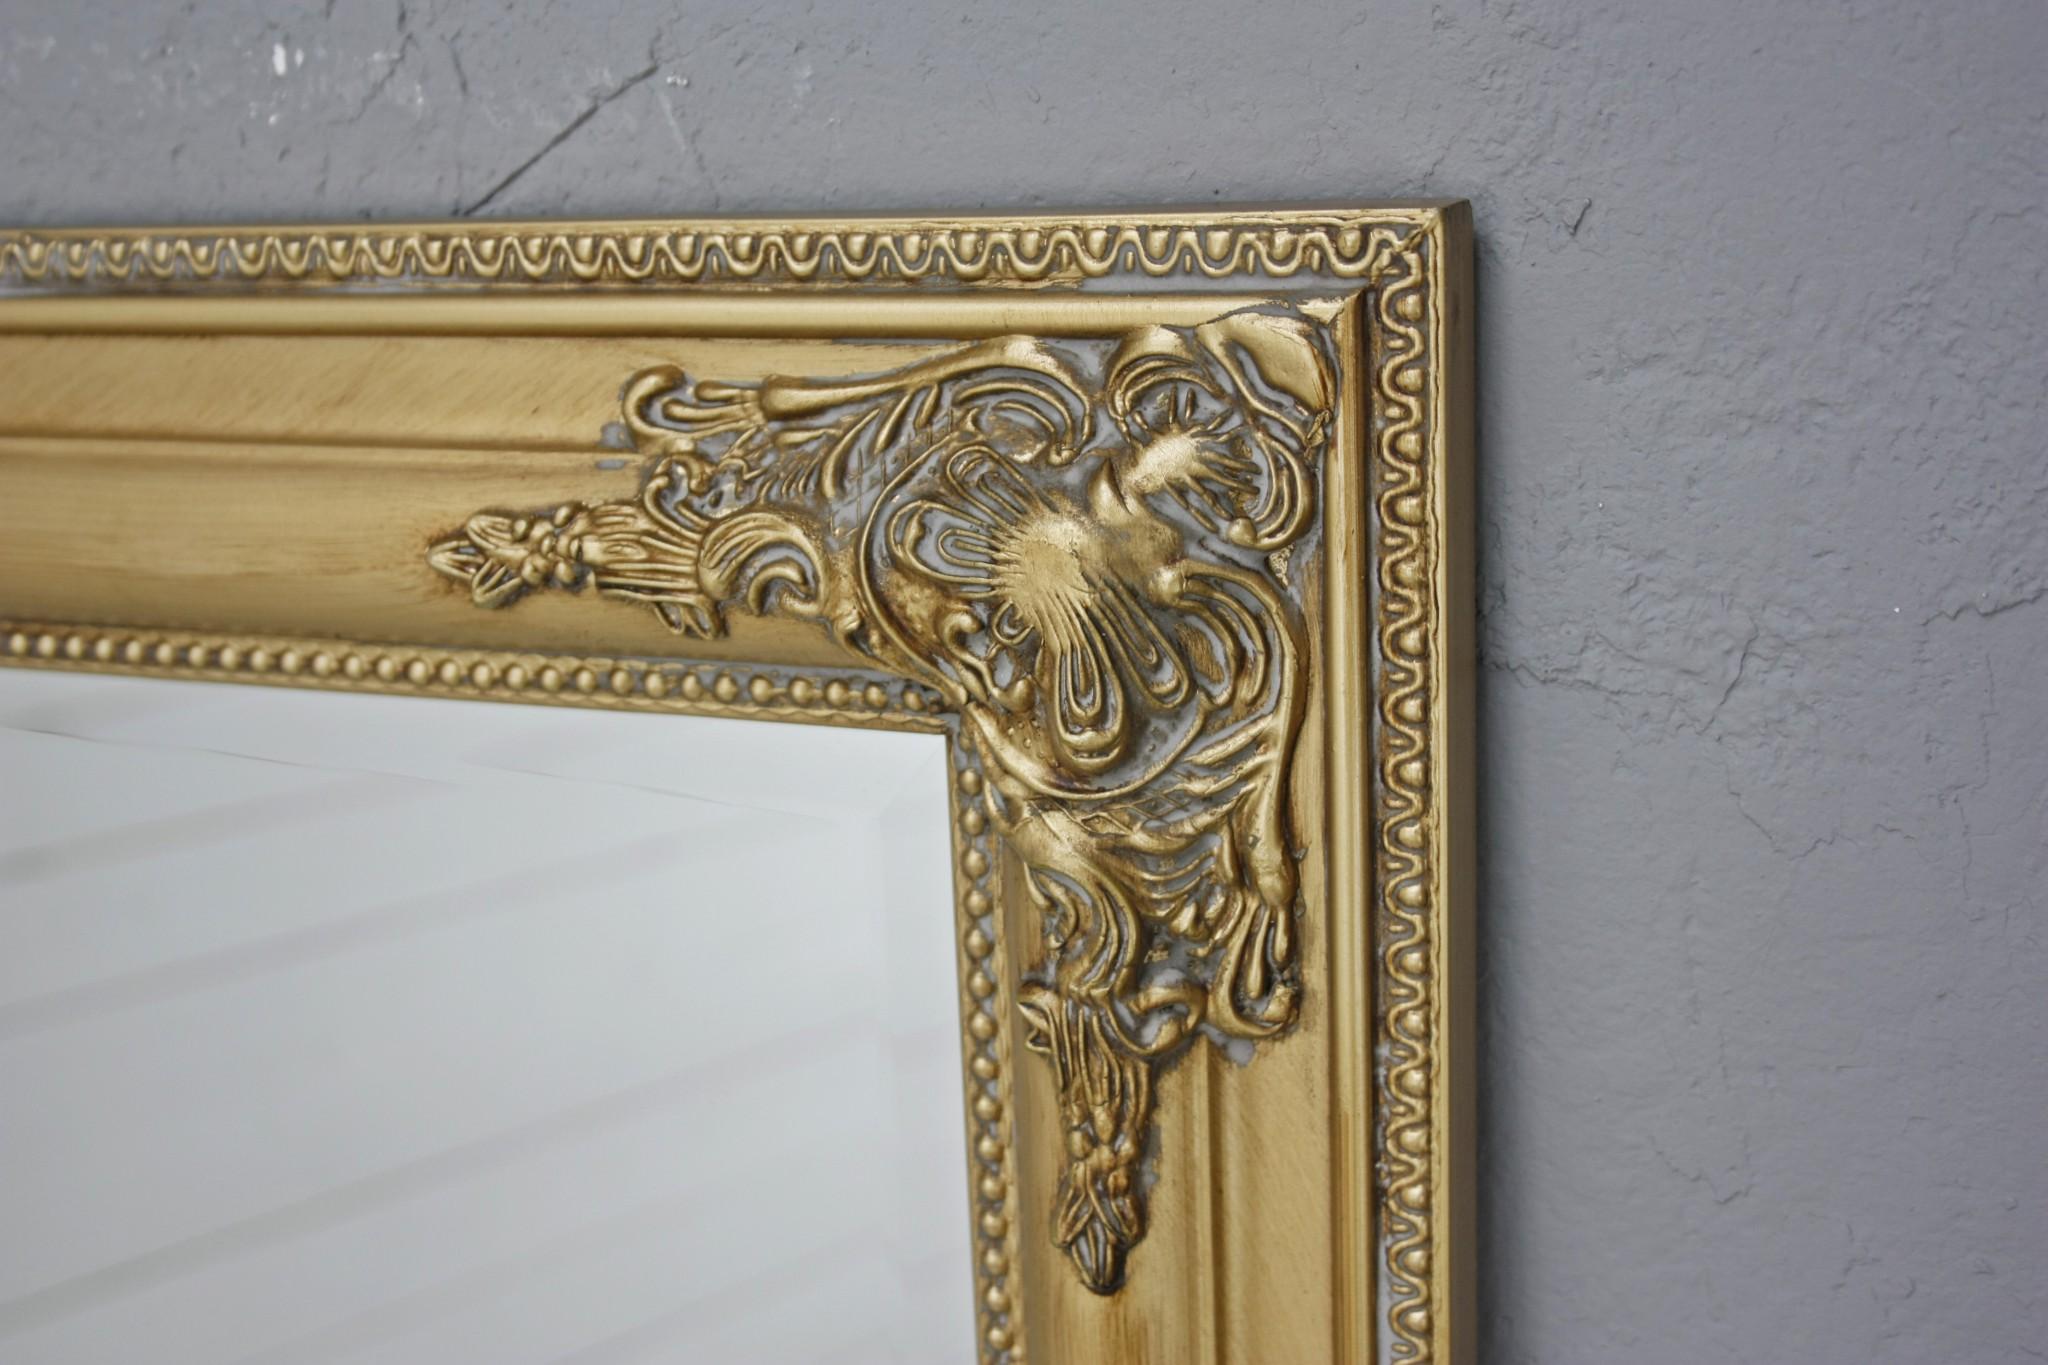 spiegel gold antik 132 x 72 cm holz wandspiegel barock badspiegel standspiegel ebay. Black Bedroom Furniture Sets. Home Design Ideas